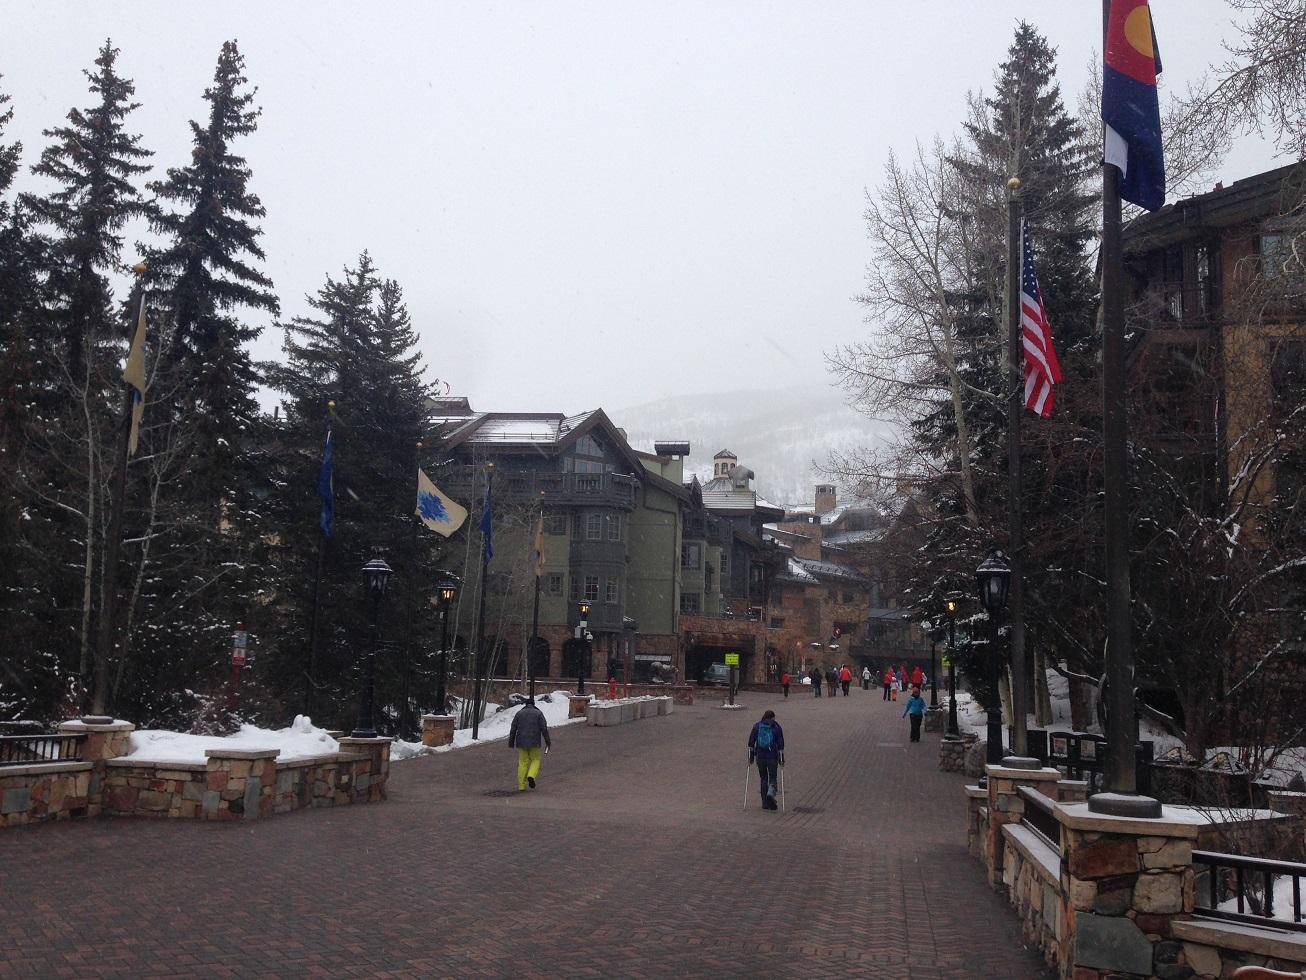 Vail滑雪场 (1).JPG